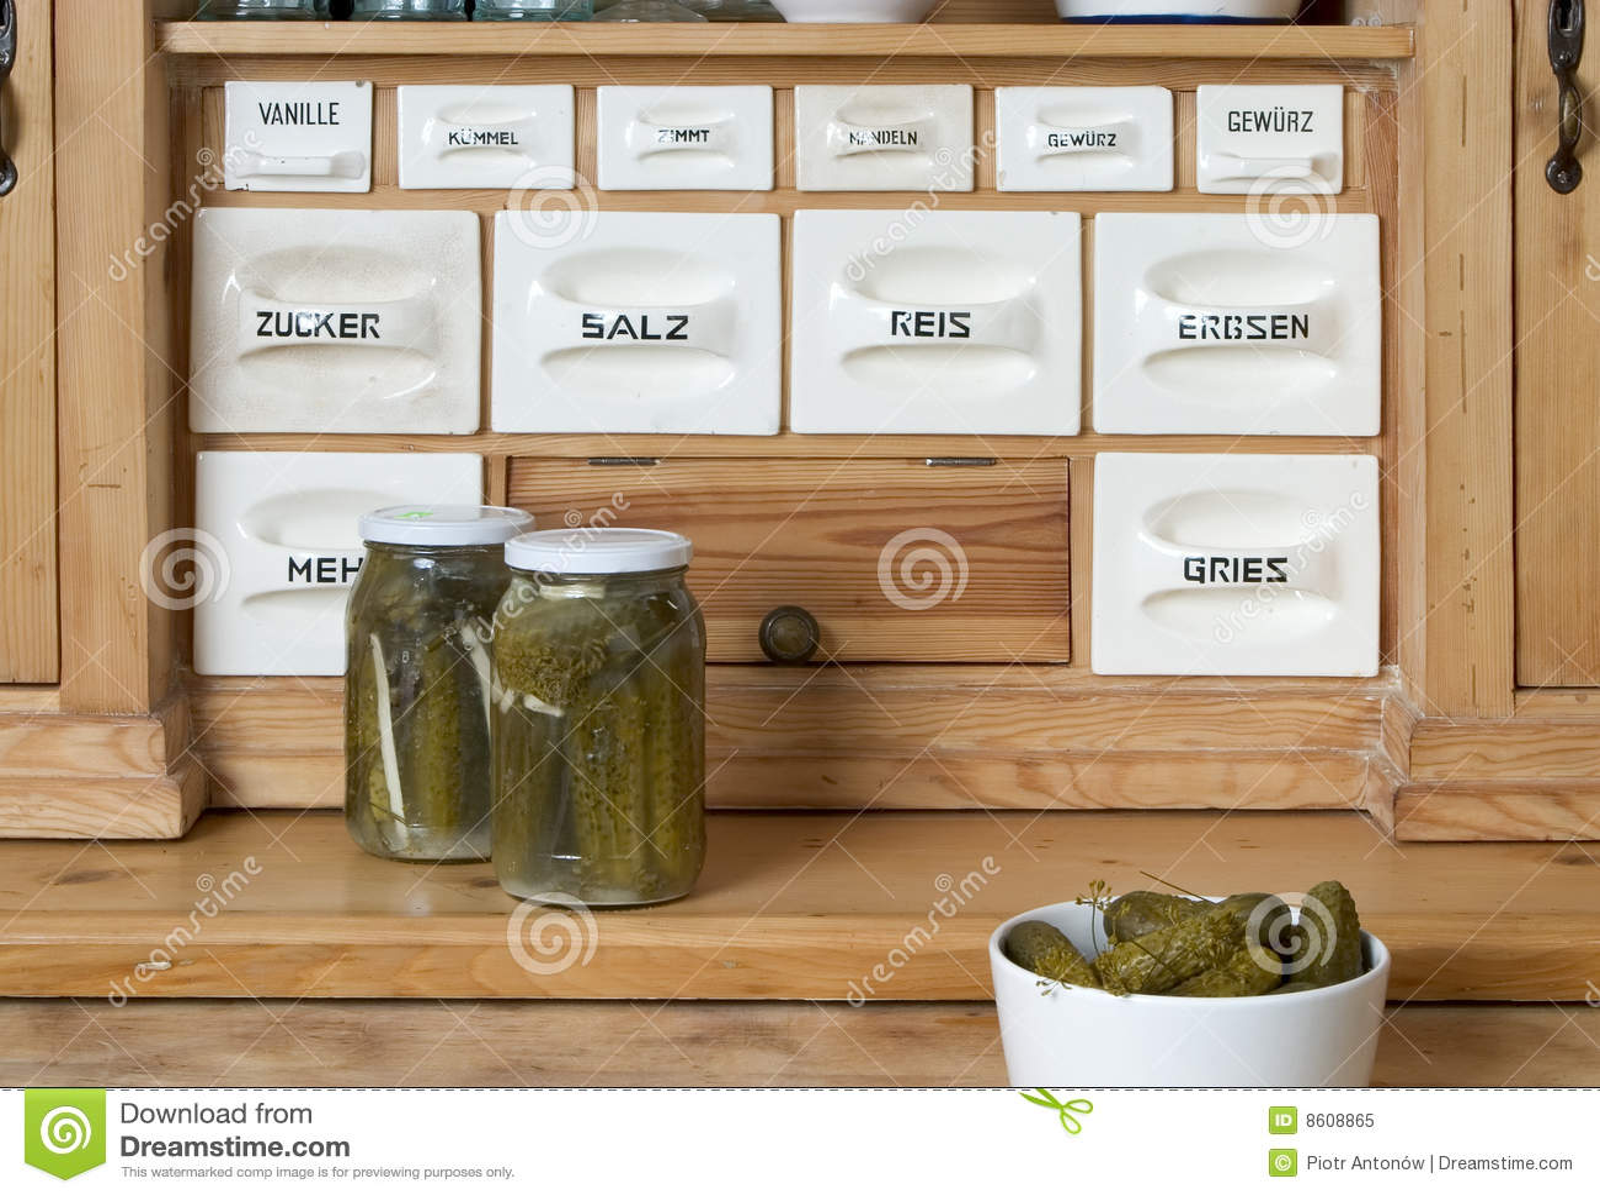 Aparador en cocina foto de archivo libre de regal as for Aparador cocina